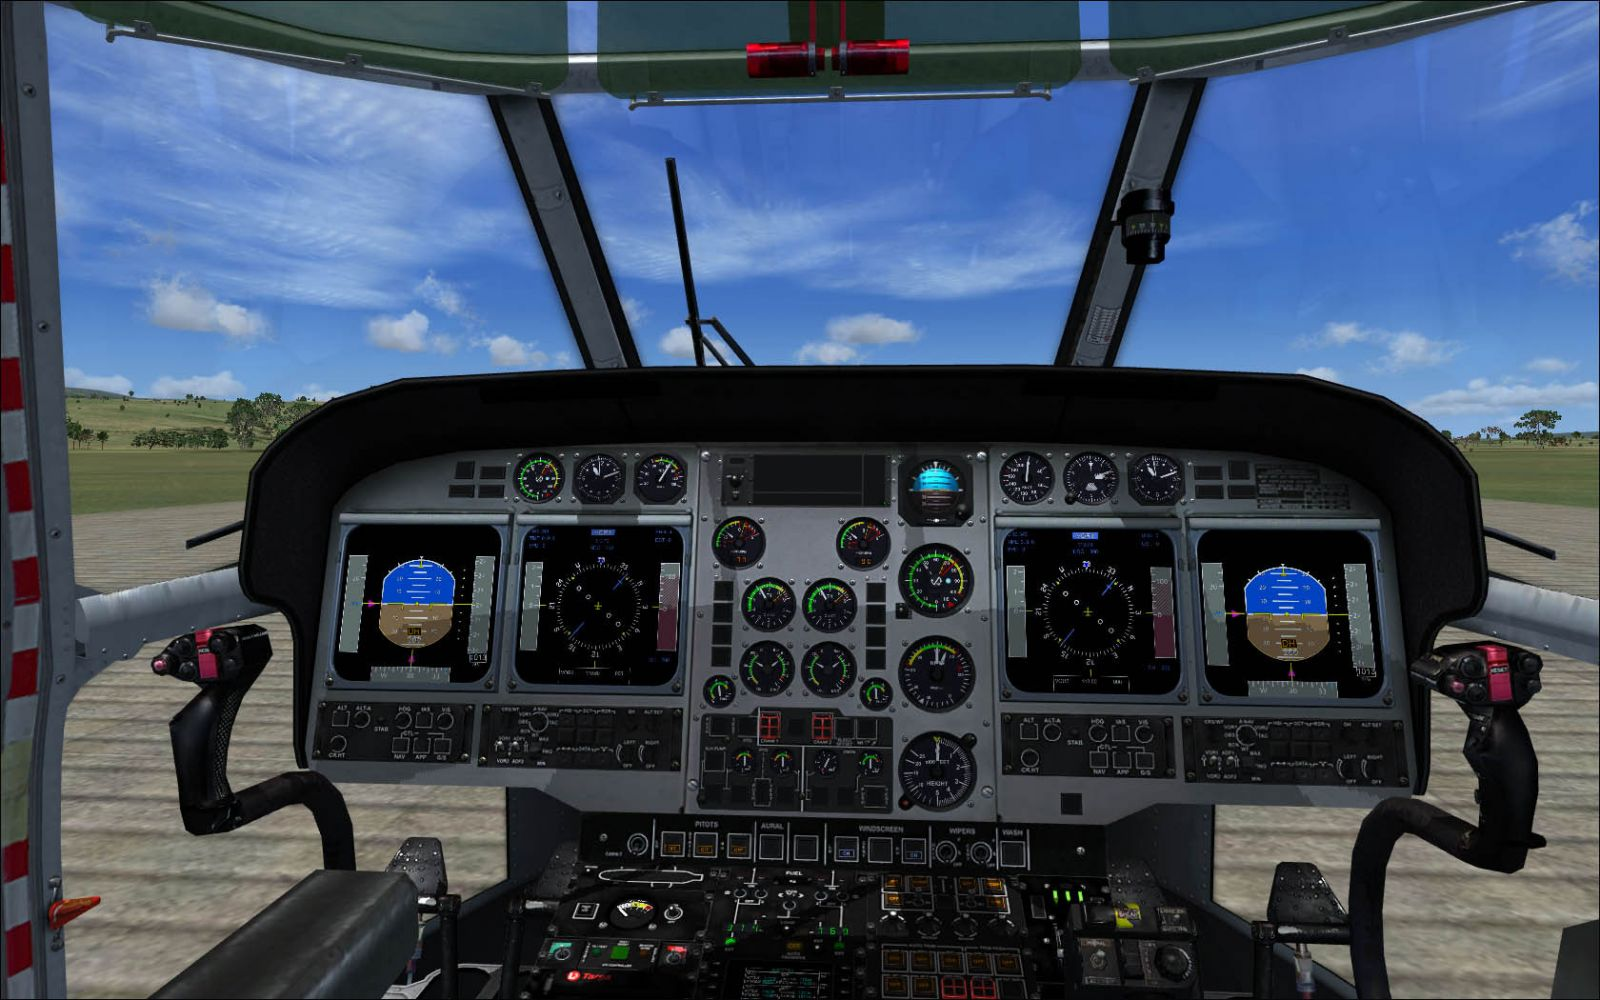 Nemeth Designs Eurocopter As332 L2 Super Puma Released